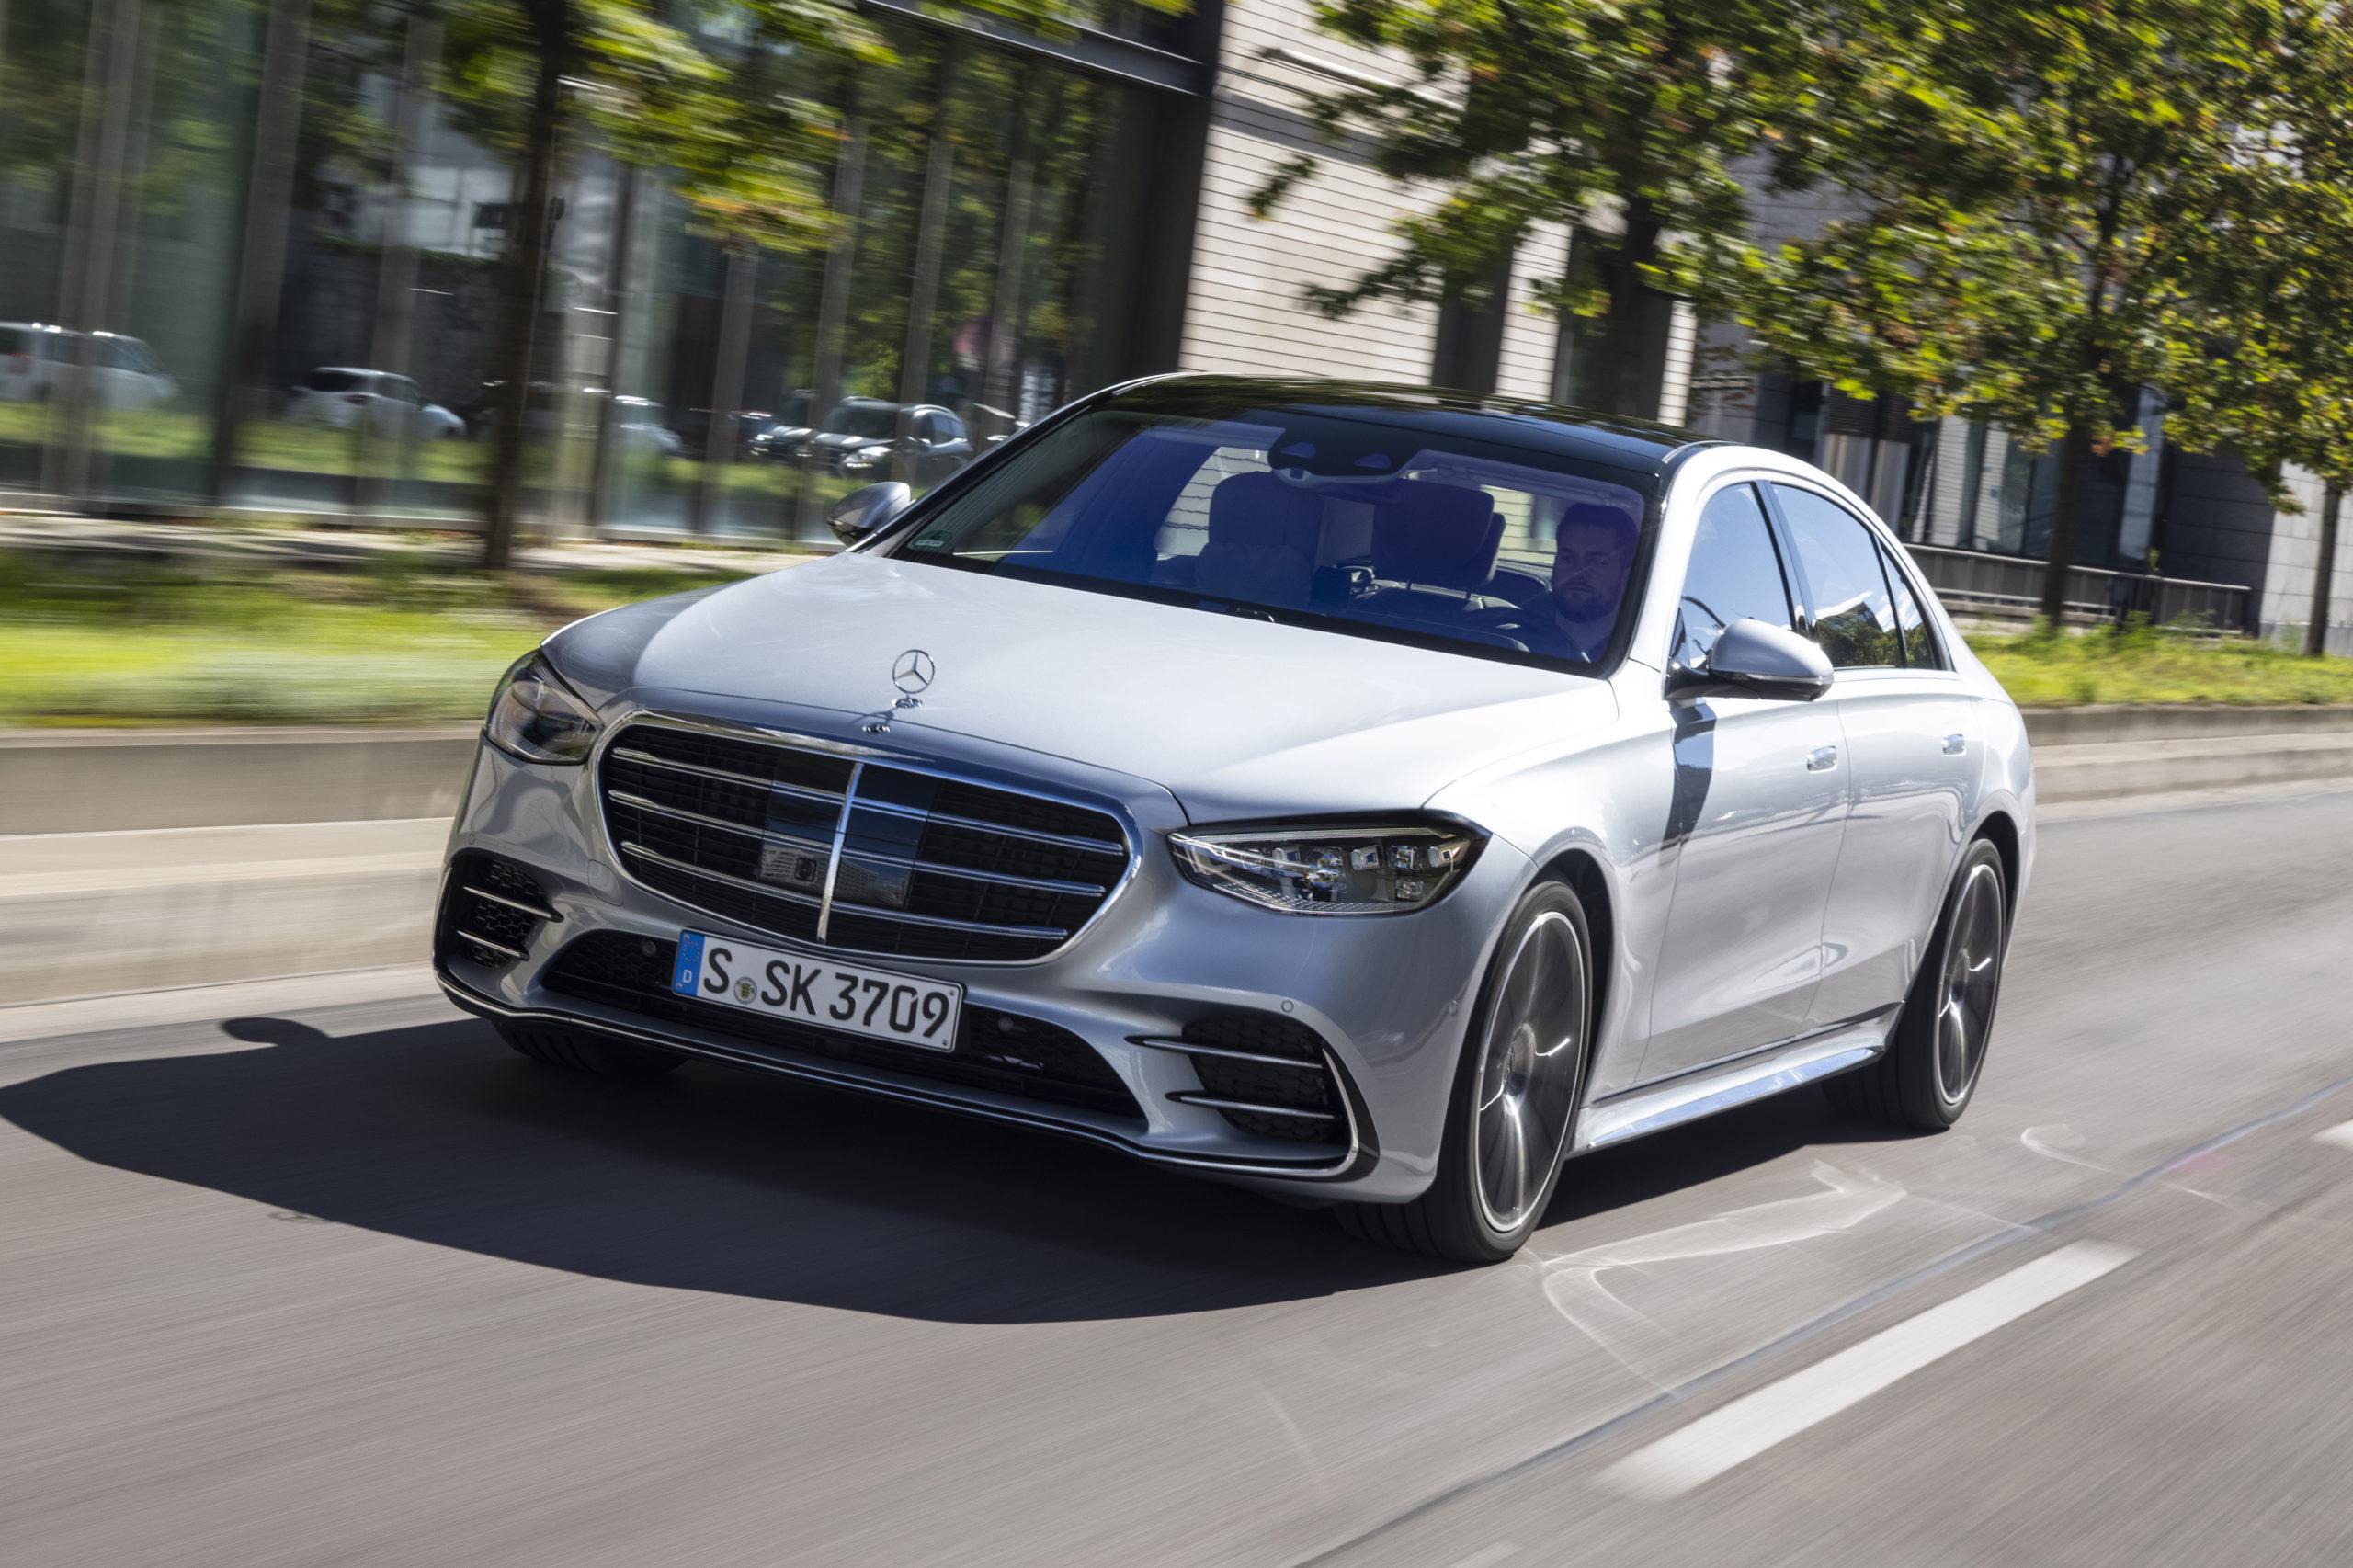 full-size luxury sedan - 2022 Mercedes-Benz S-Class